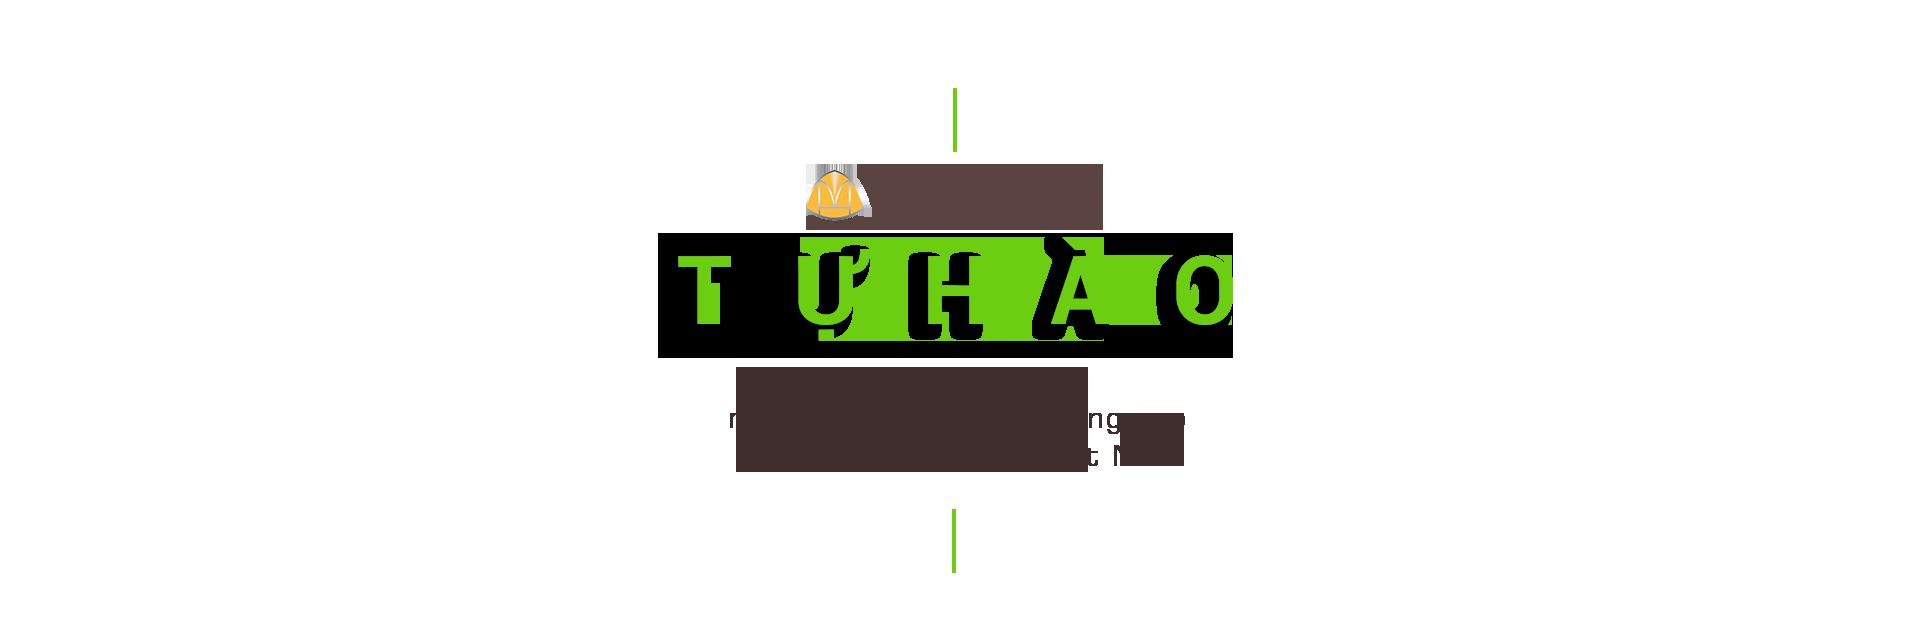 Background-text-tu-hao-9-1